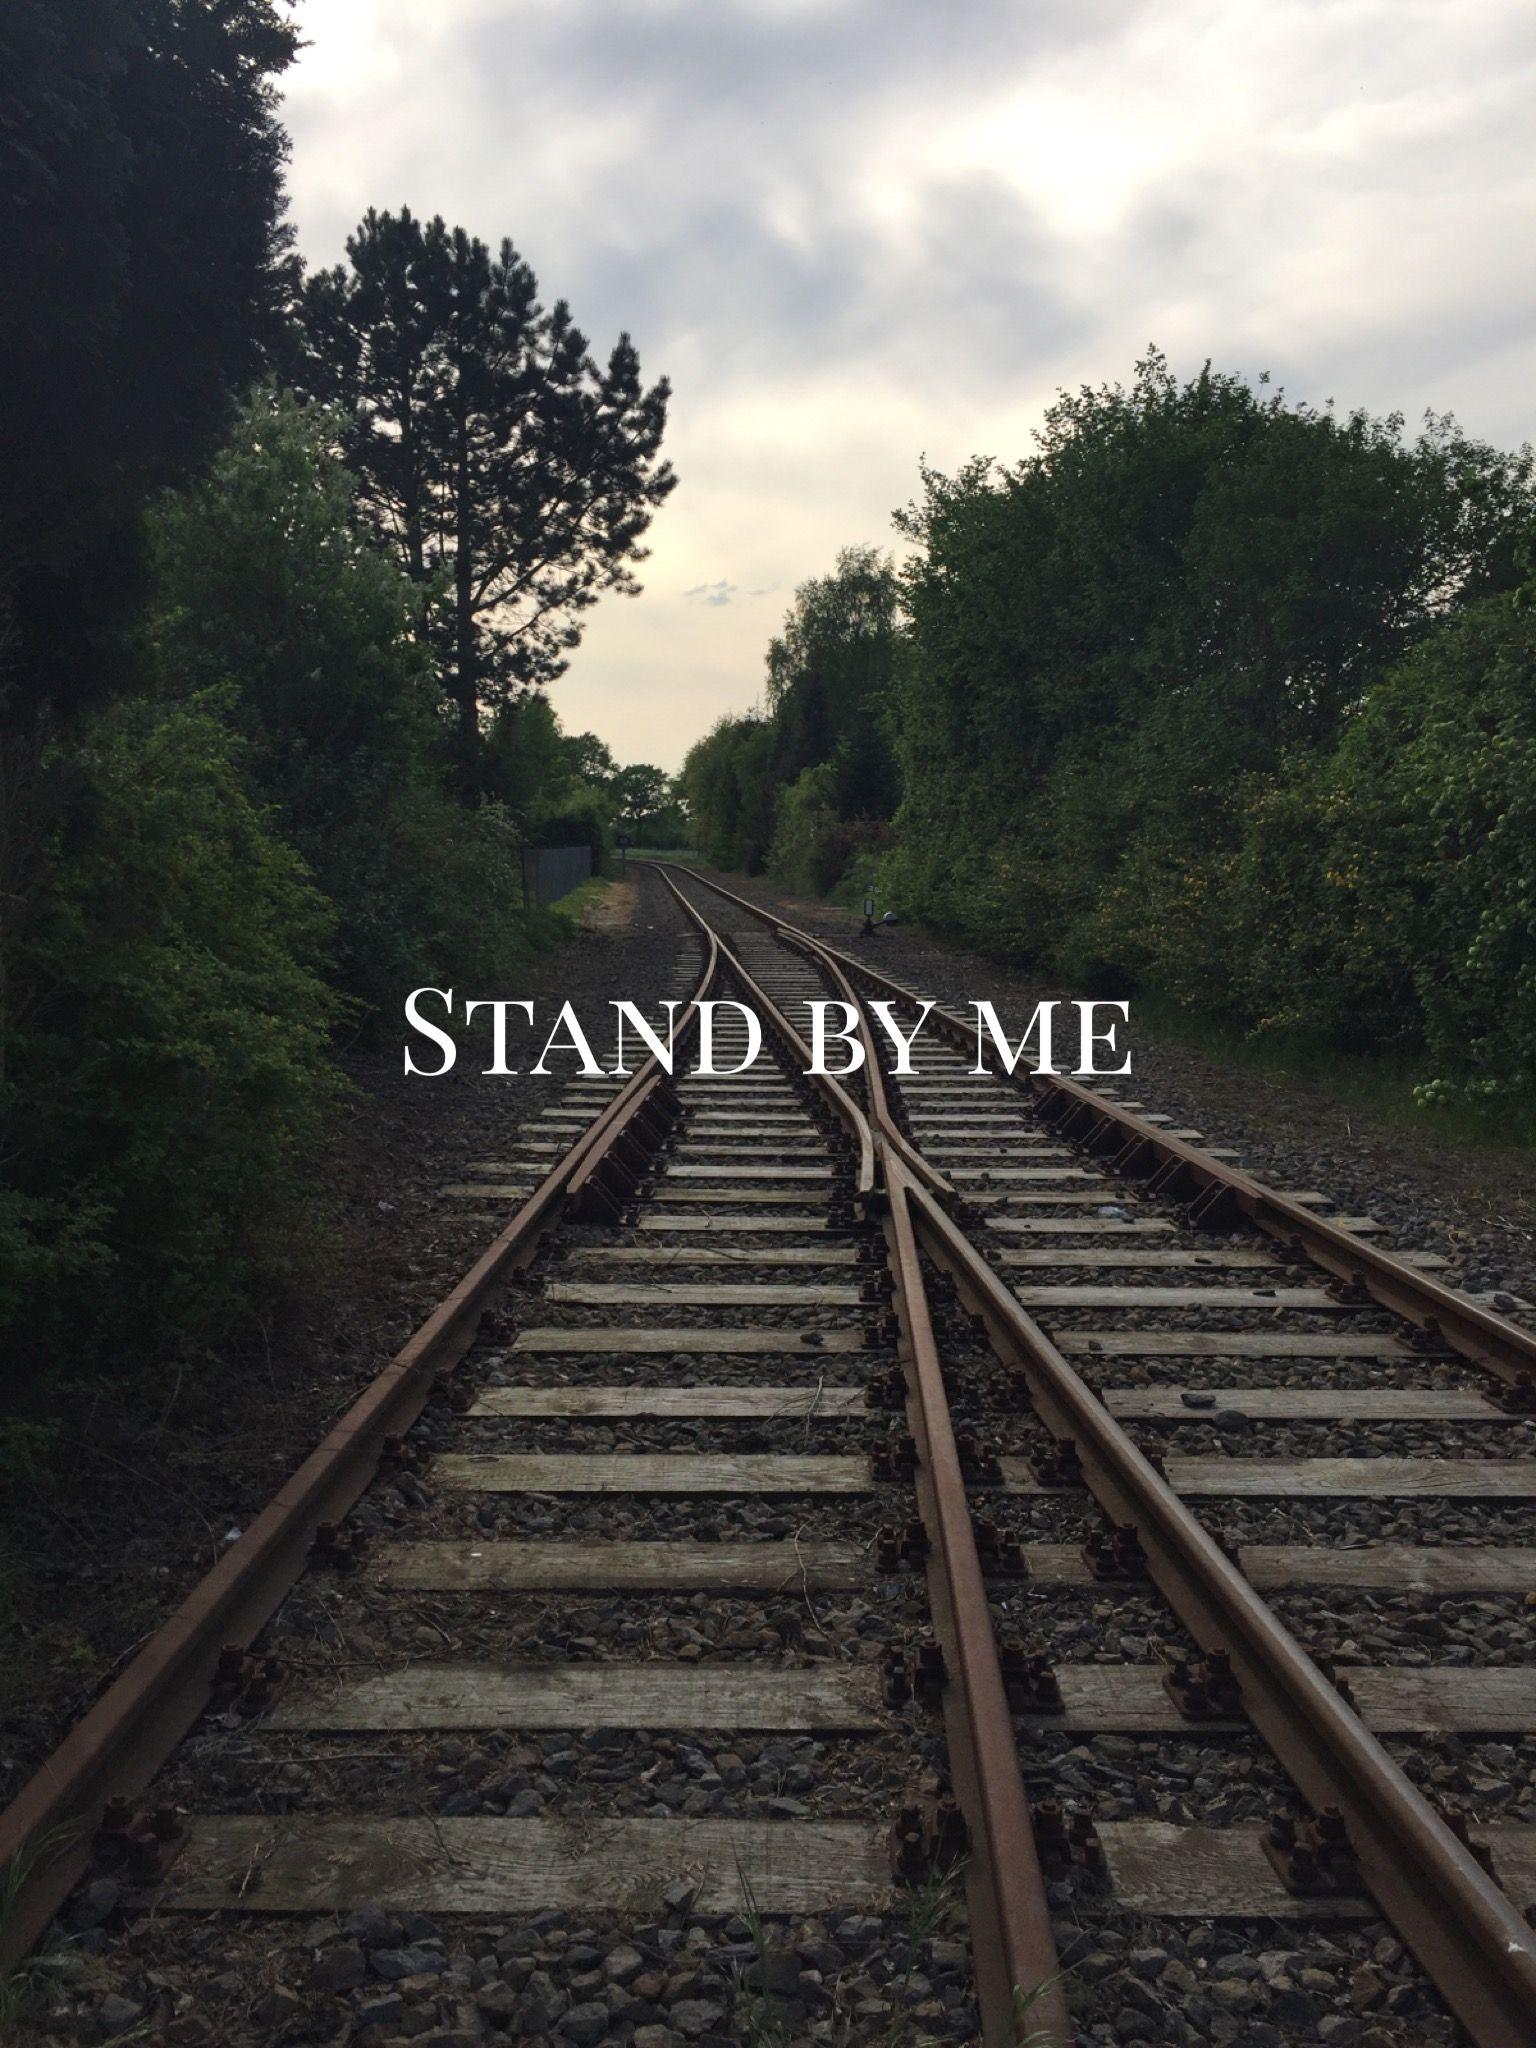 #standbyme